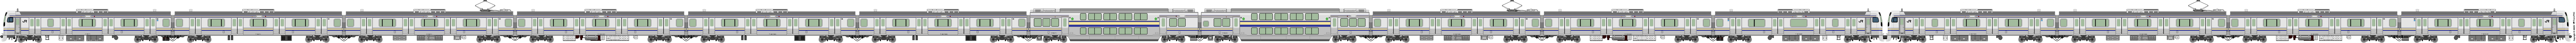 Train 5014